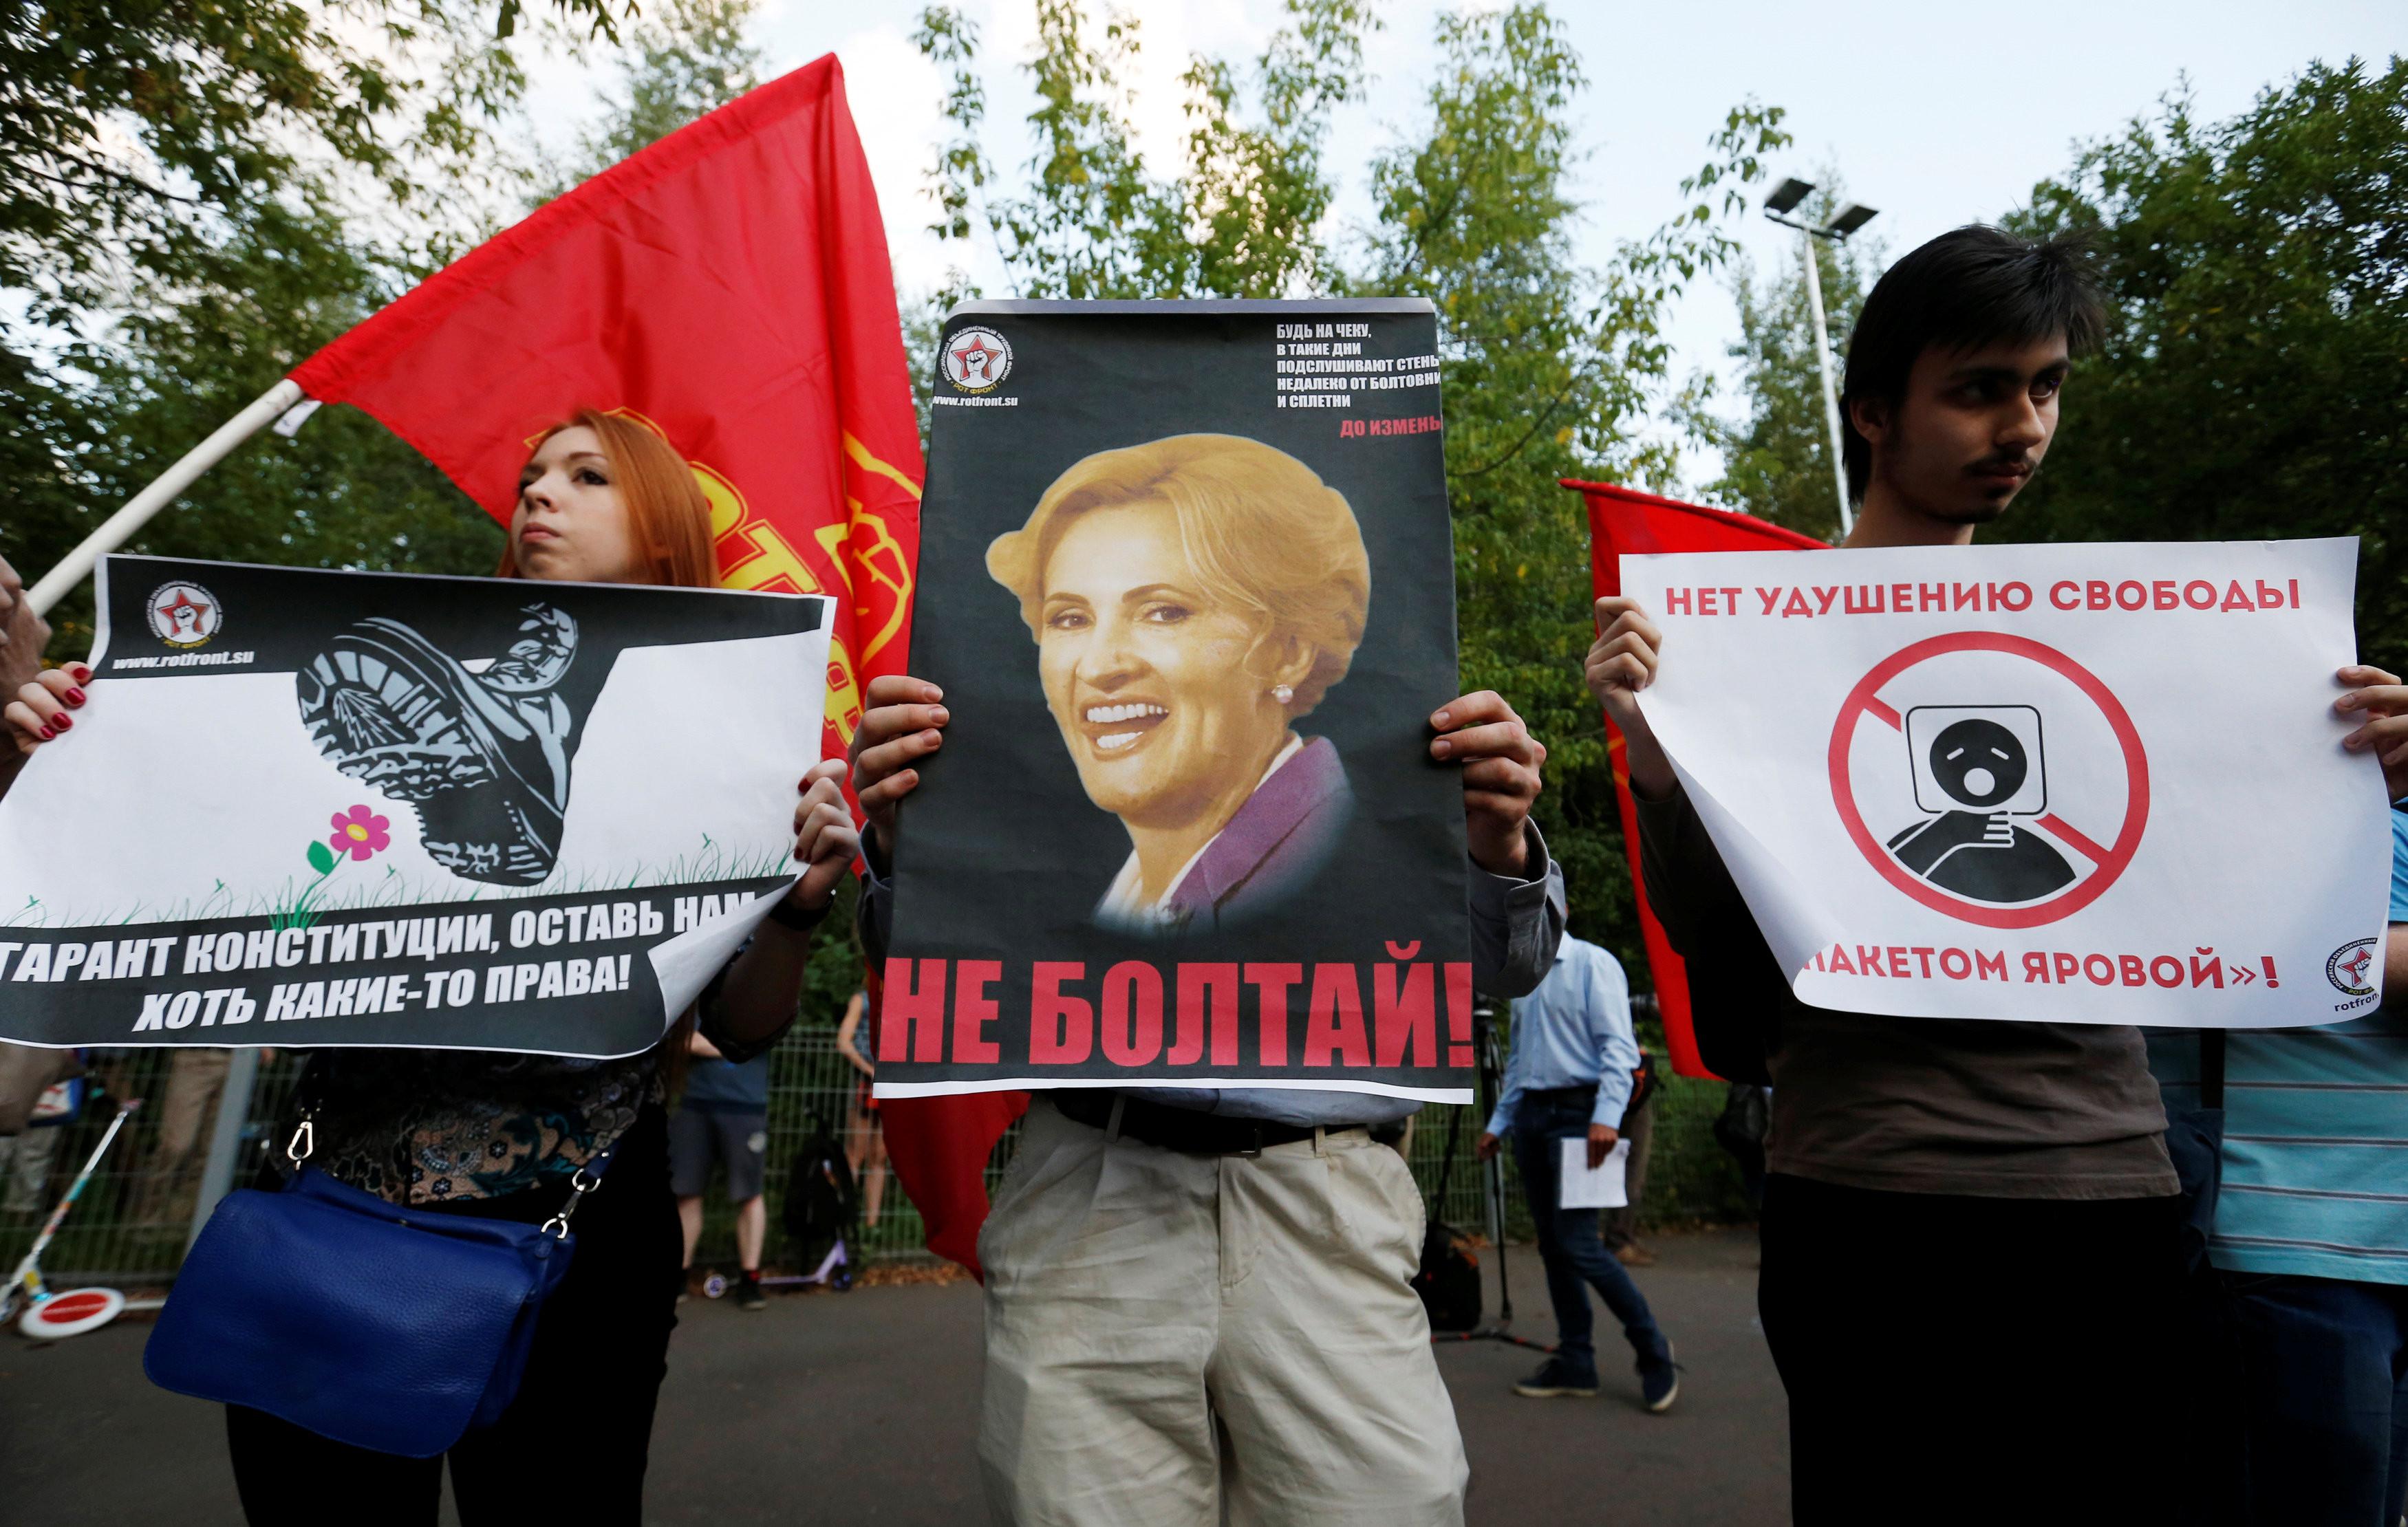 <p>Фото: &copy; REUTERS/Maxim Zmeyev</p>